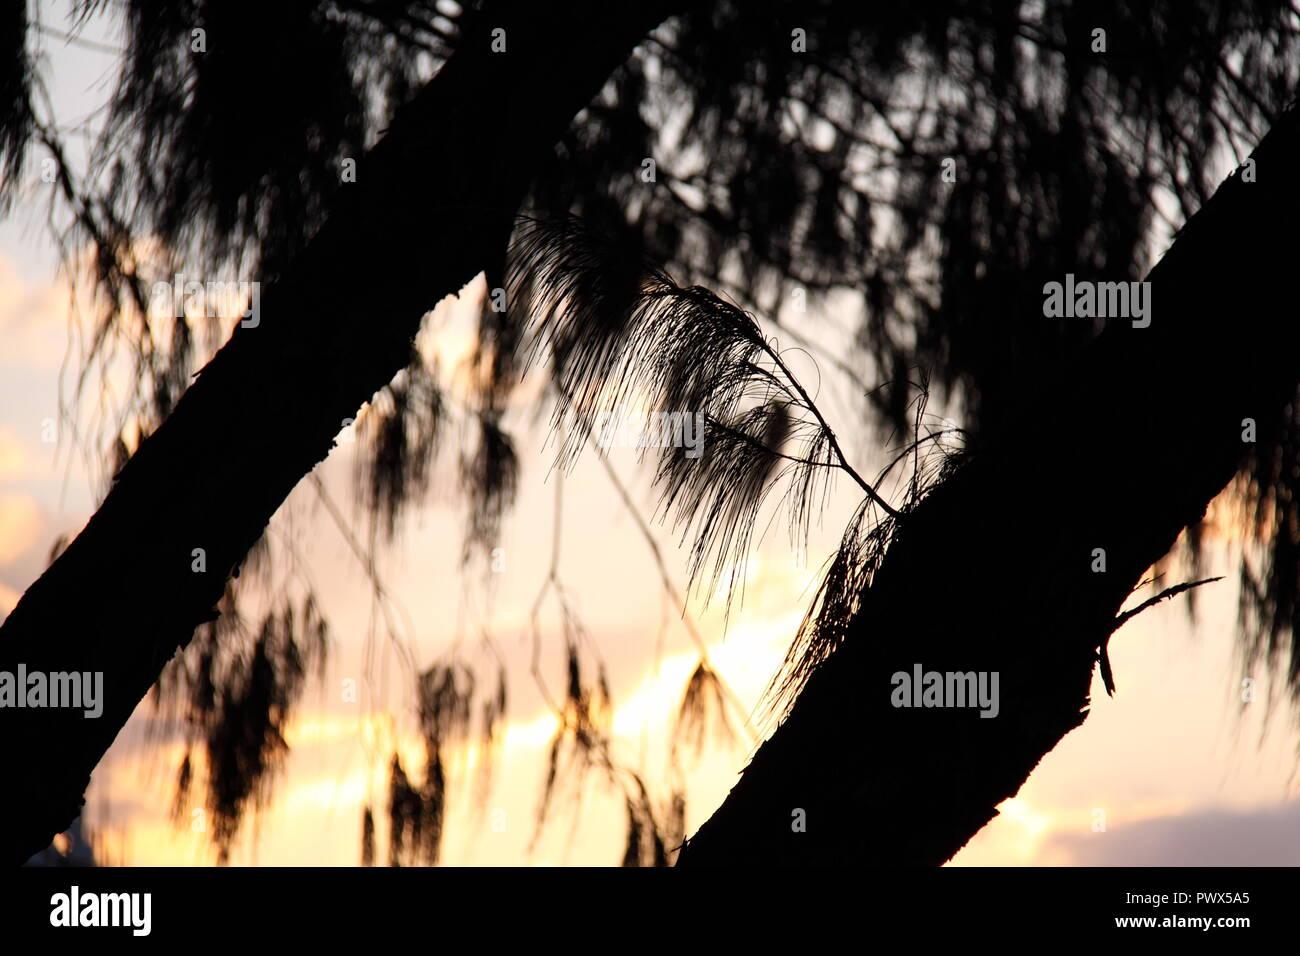 Silhouette of the Horsetail She-Oak (Casuarina Equisetifolia) at Sunset - Stock Image